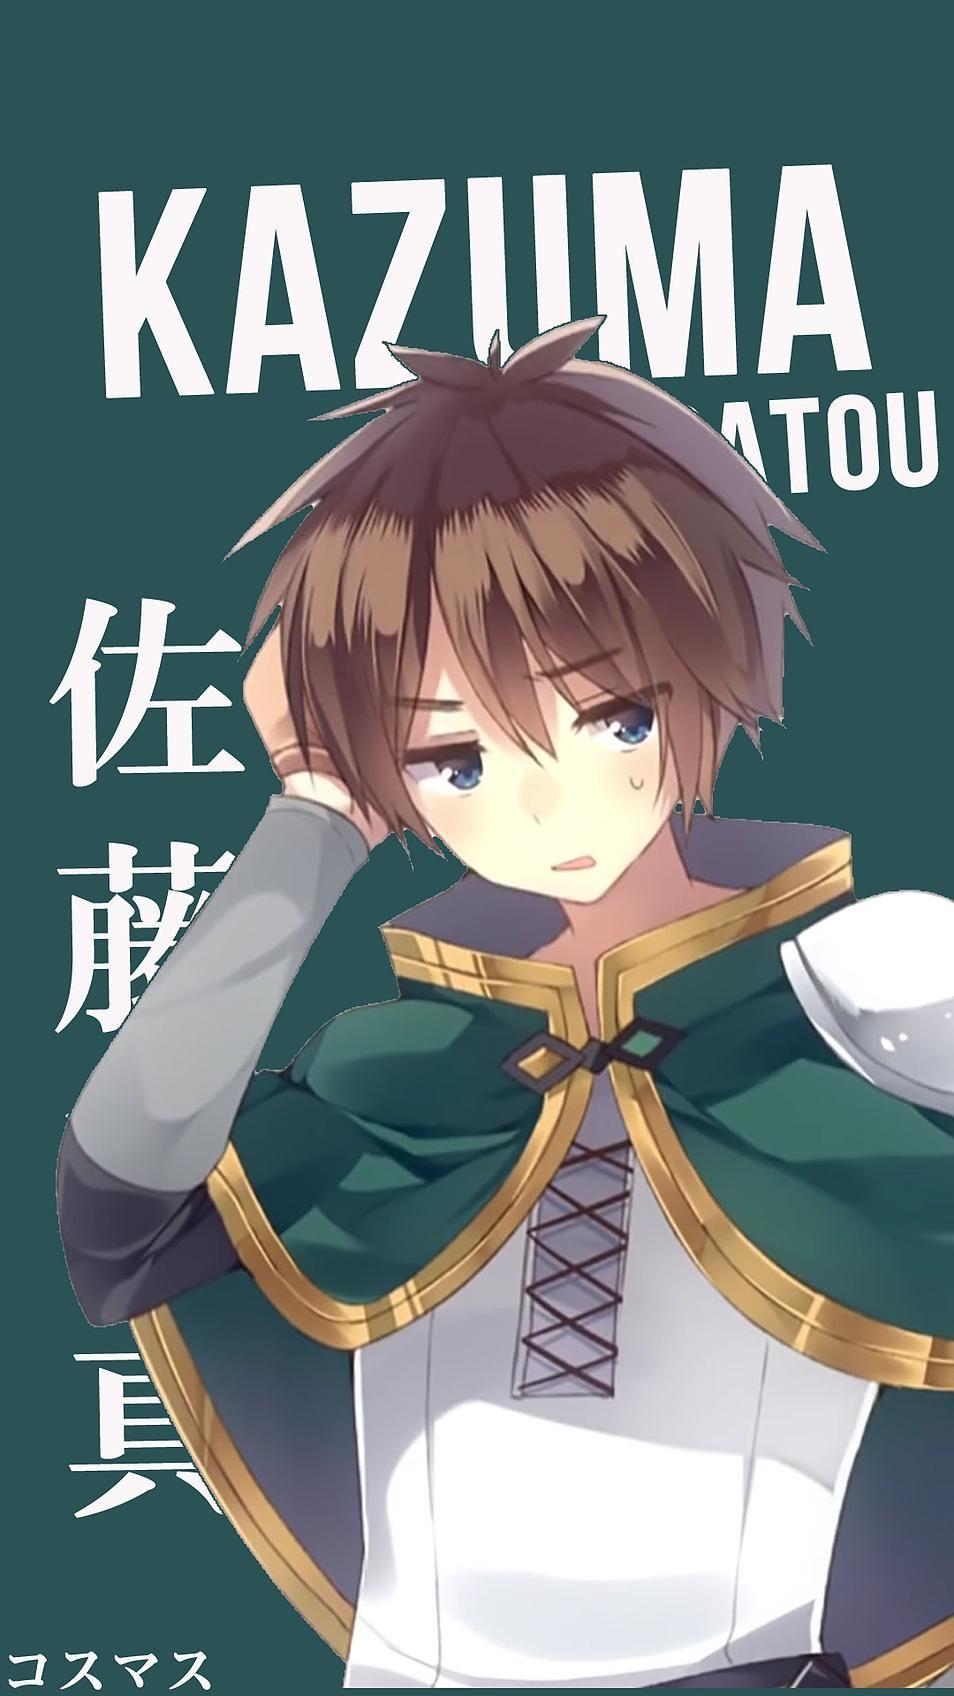 Kazuma Katou Korigengi Wallpaper Anime Anime Life All Anime Manga Anime